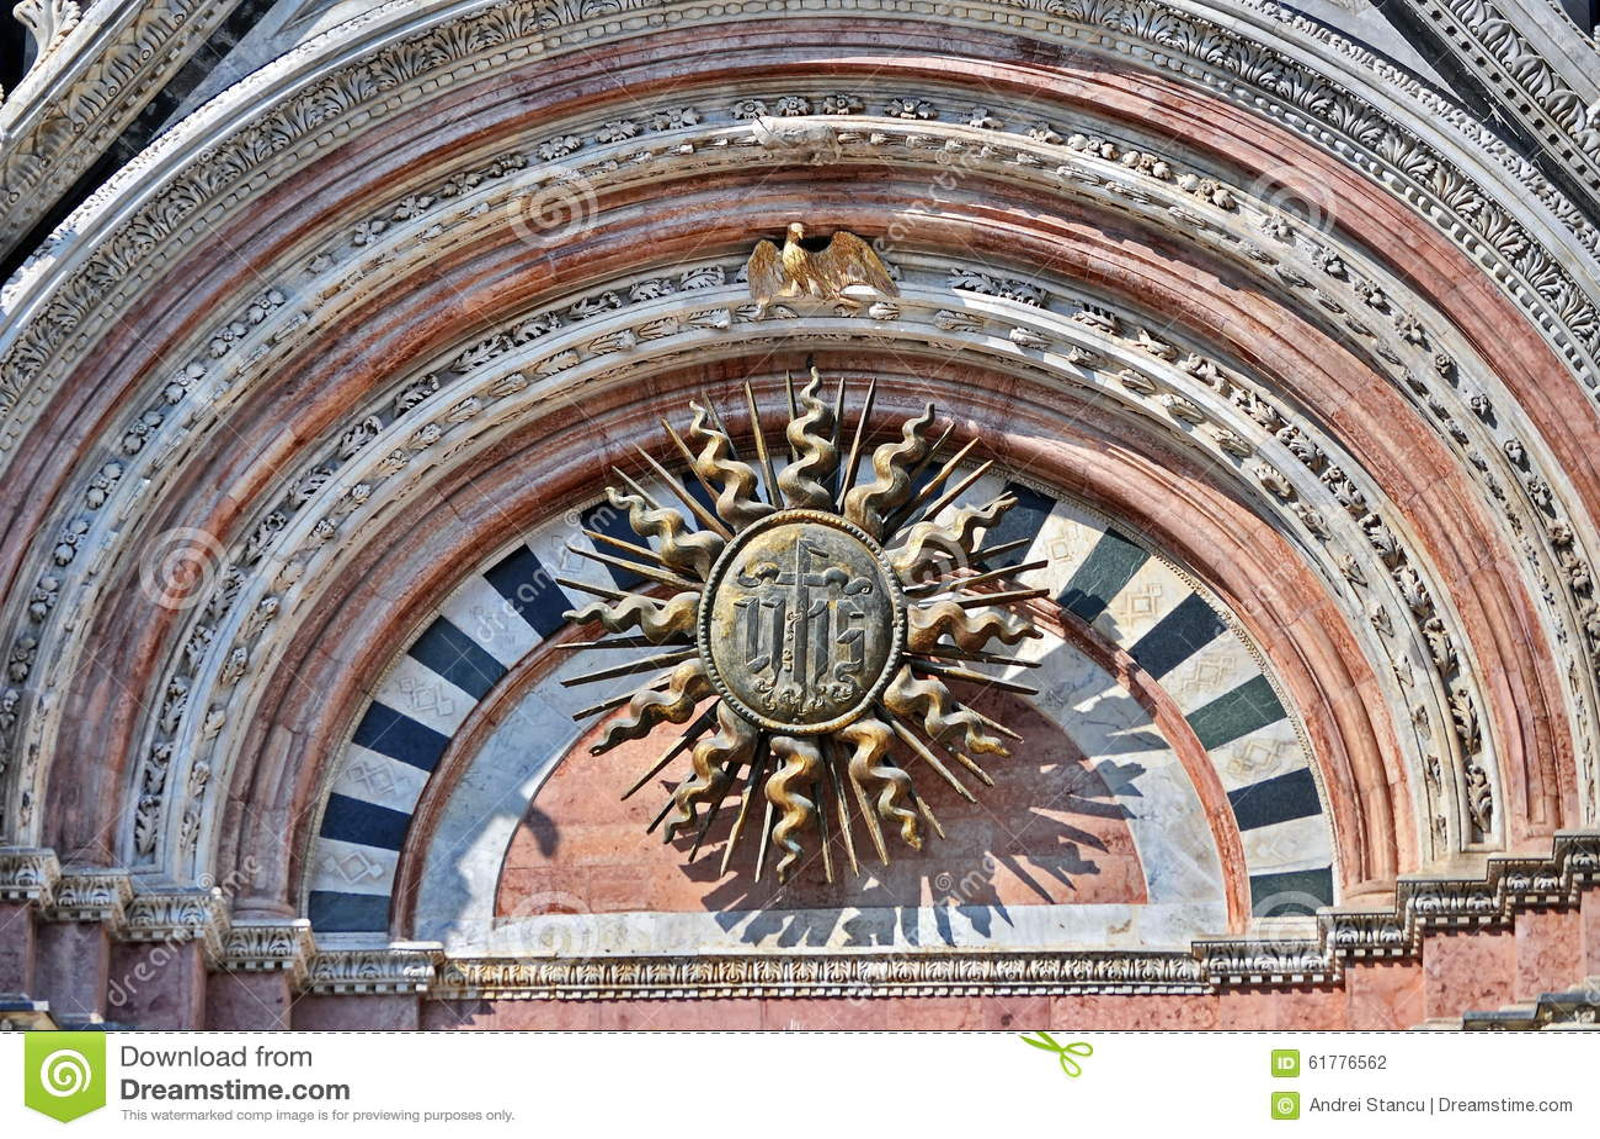 Siena Cathedral detail